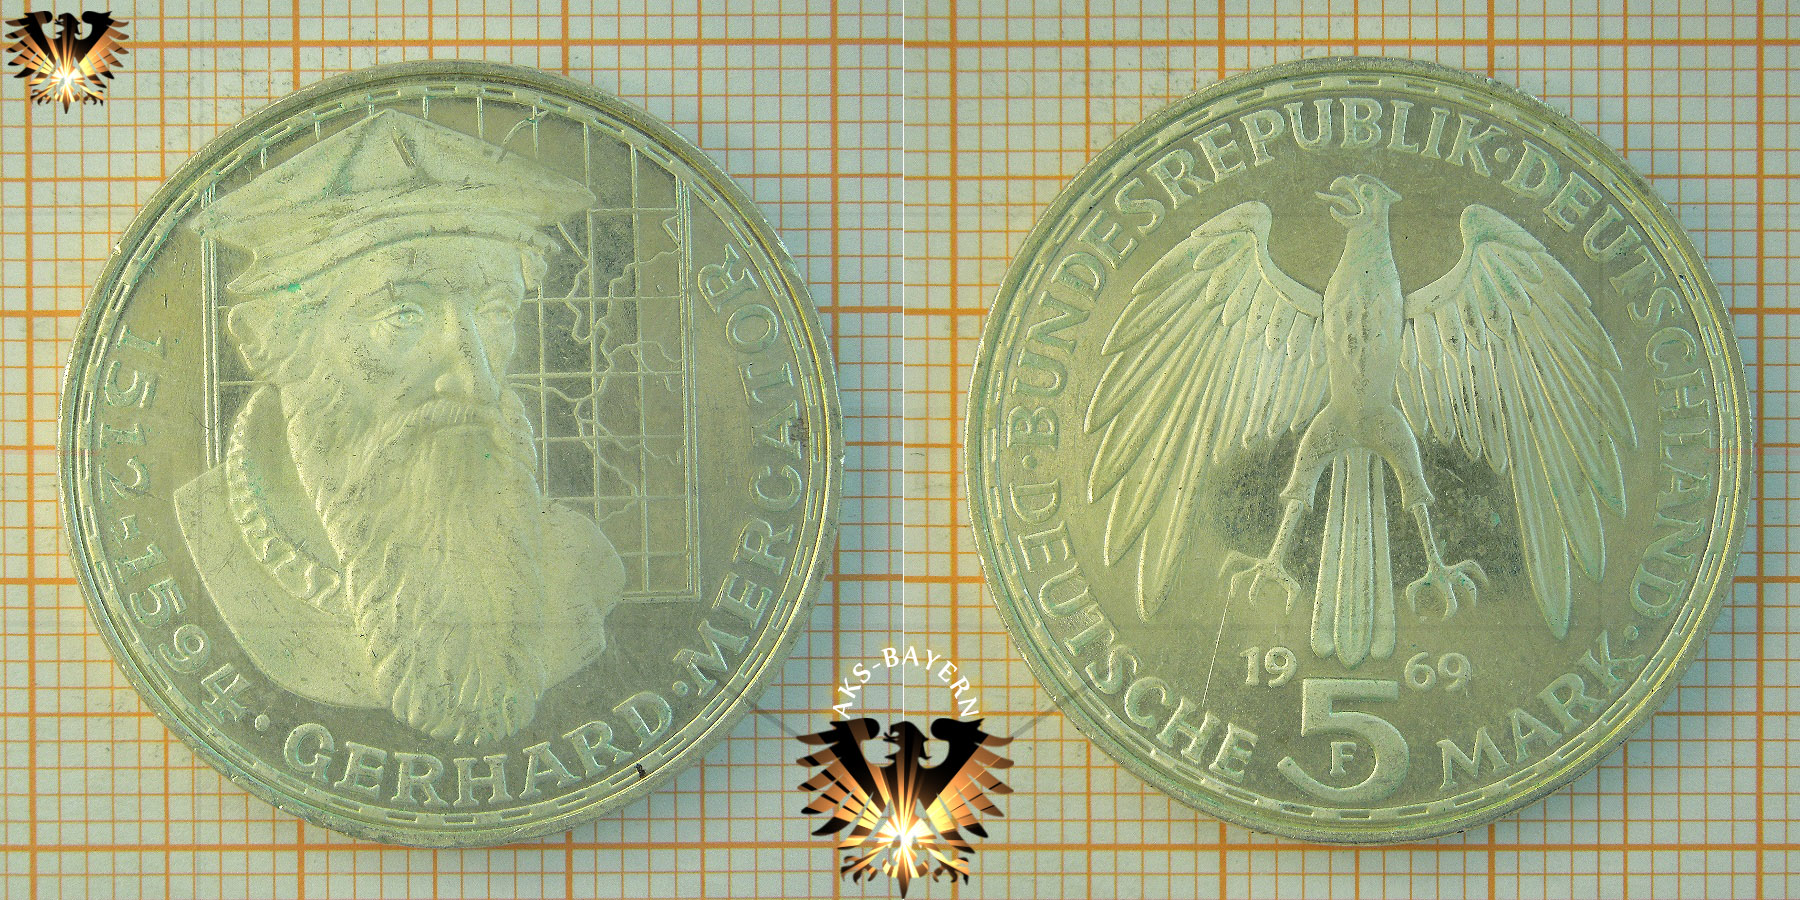 5 Dm Brd 1969 F Gerhard Mercator 1512 Bis 1594 Gedenkmünze